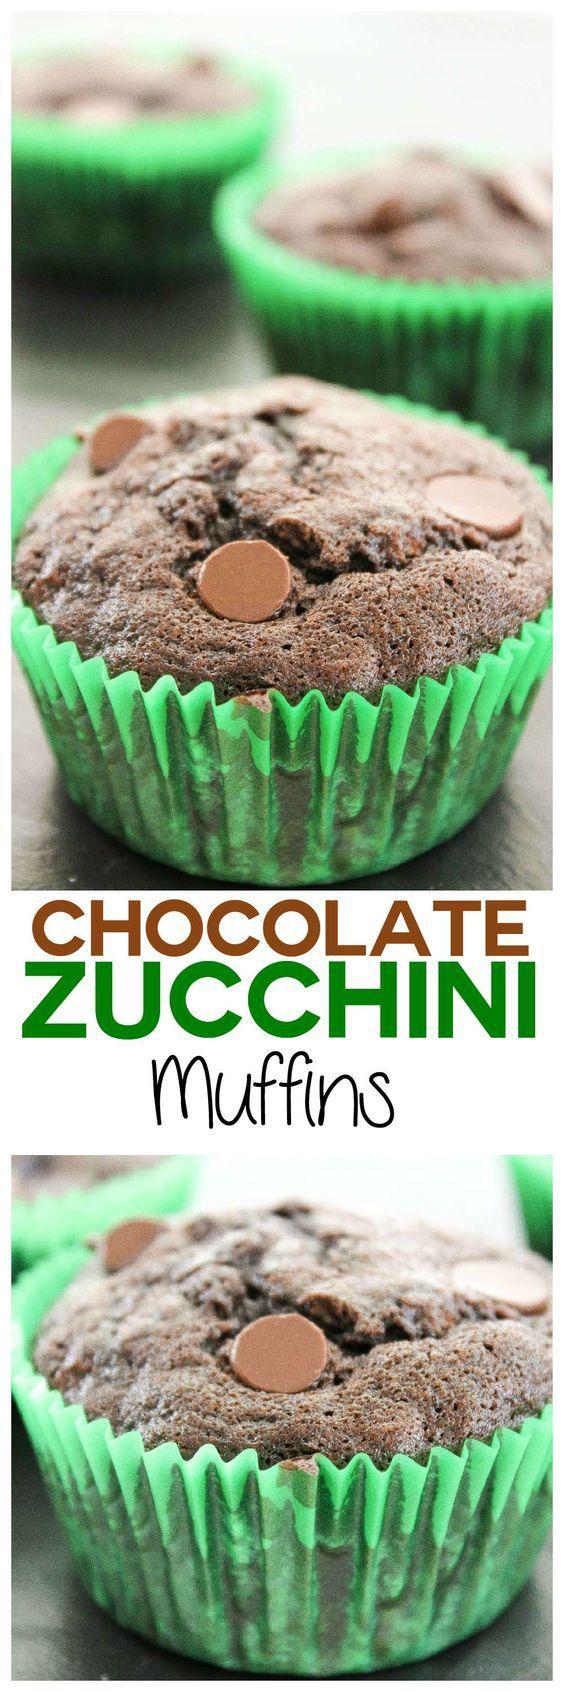 #zucchinichocolatechipmuffins #zucchini #chocolate #desserts #muffins #recipes #food #cake